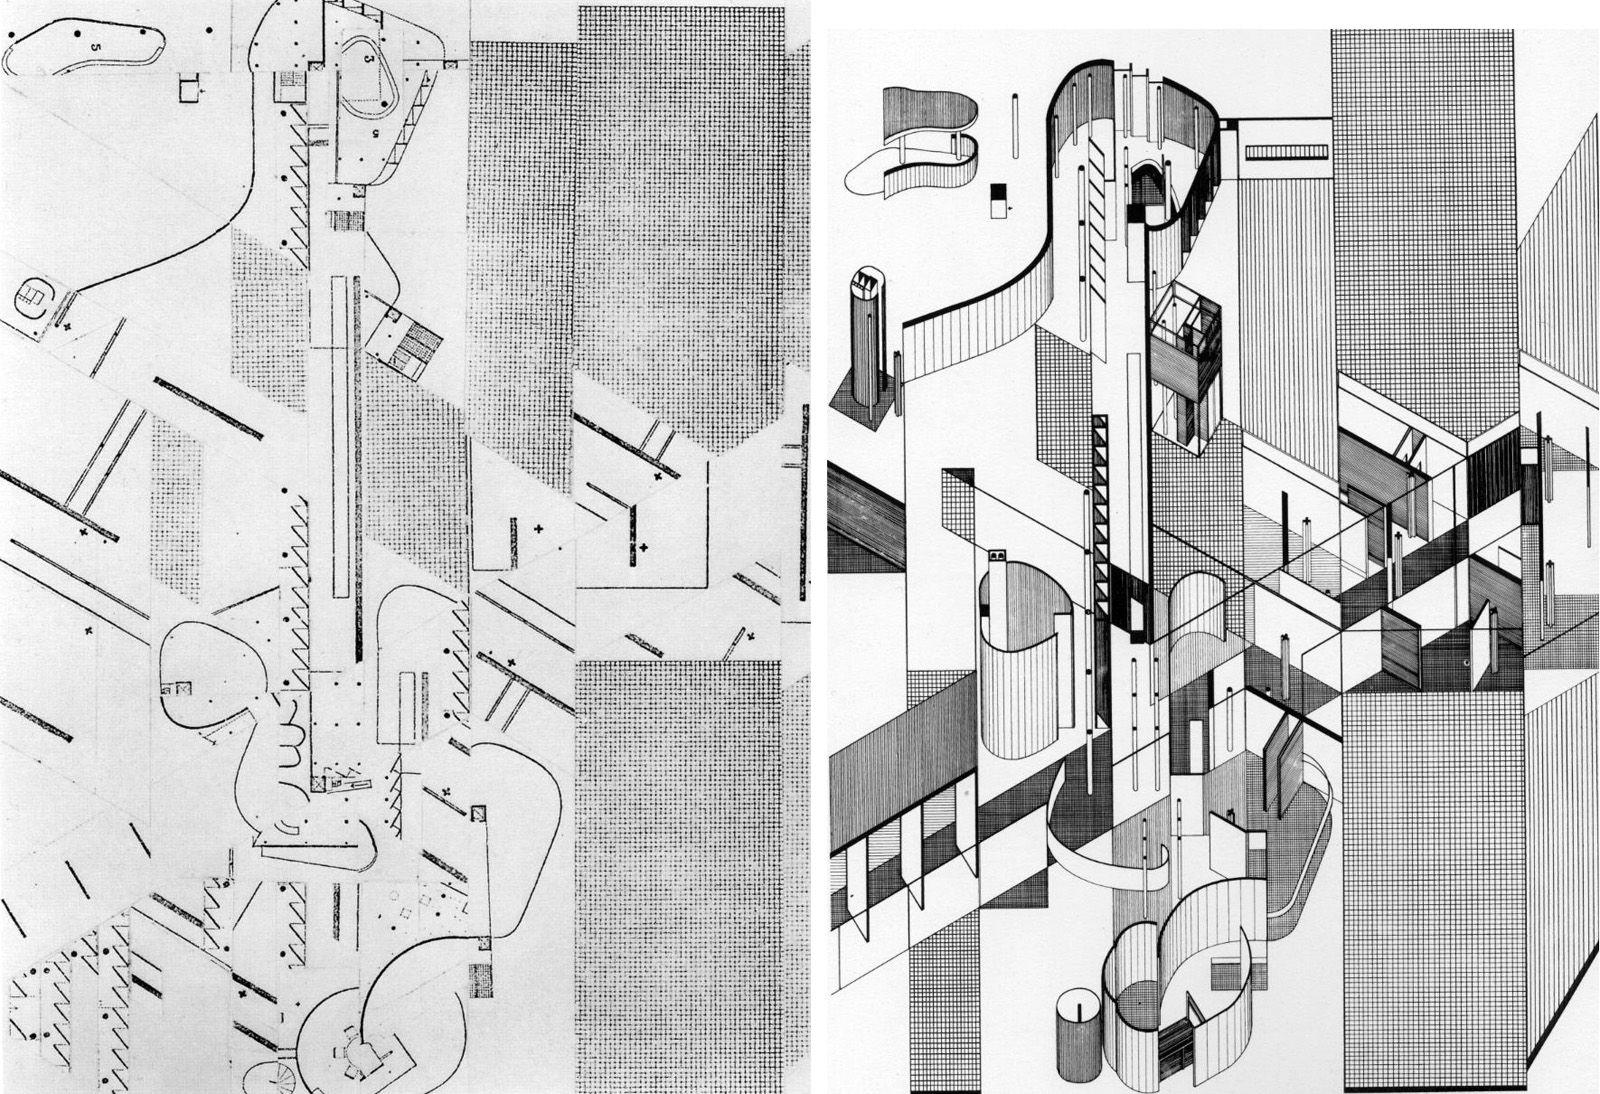 hight resolution of daniel libeskind gordon matta clark architecture student types of architecture architecture layout